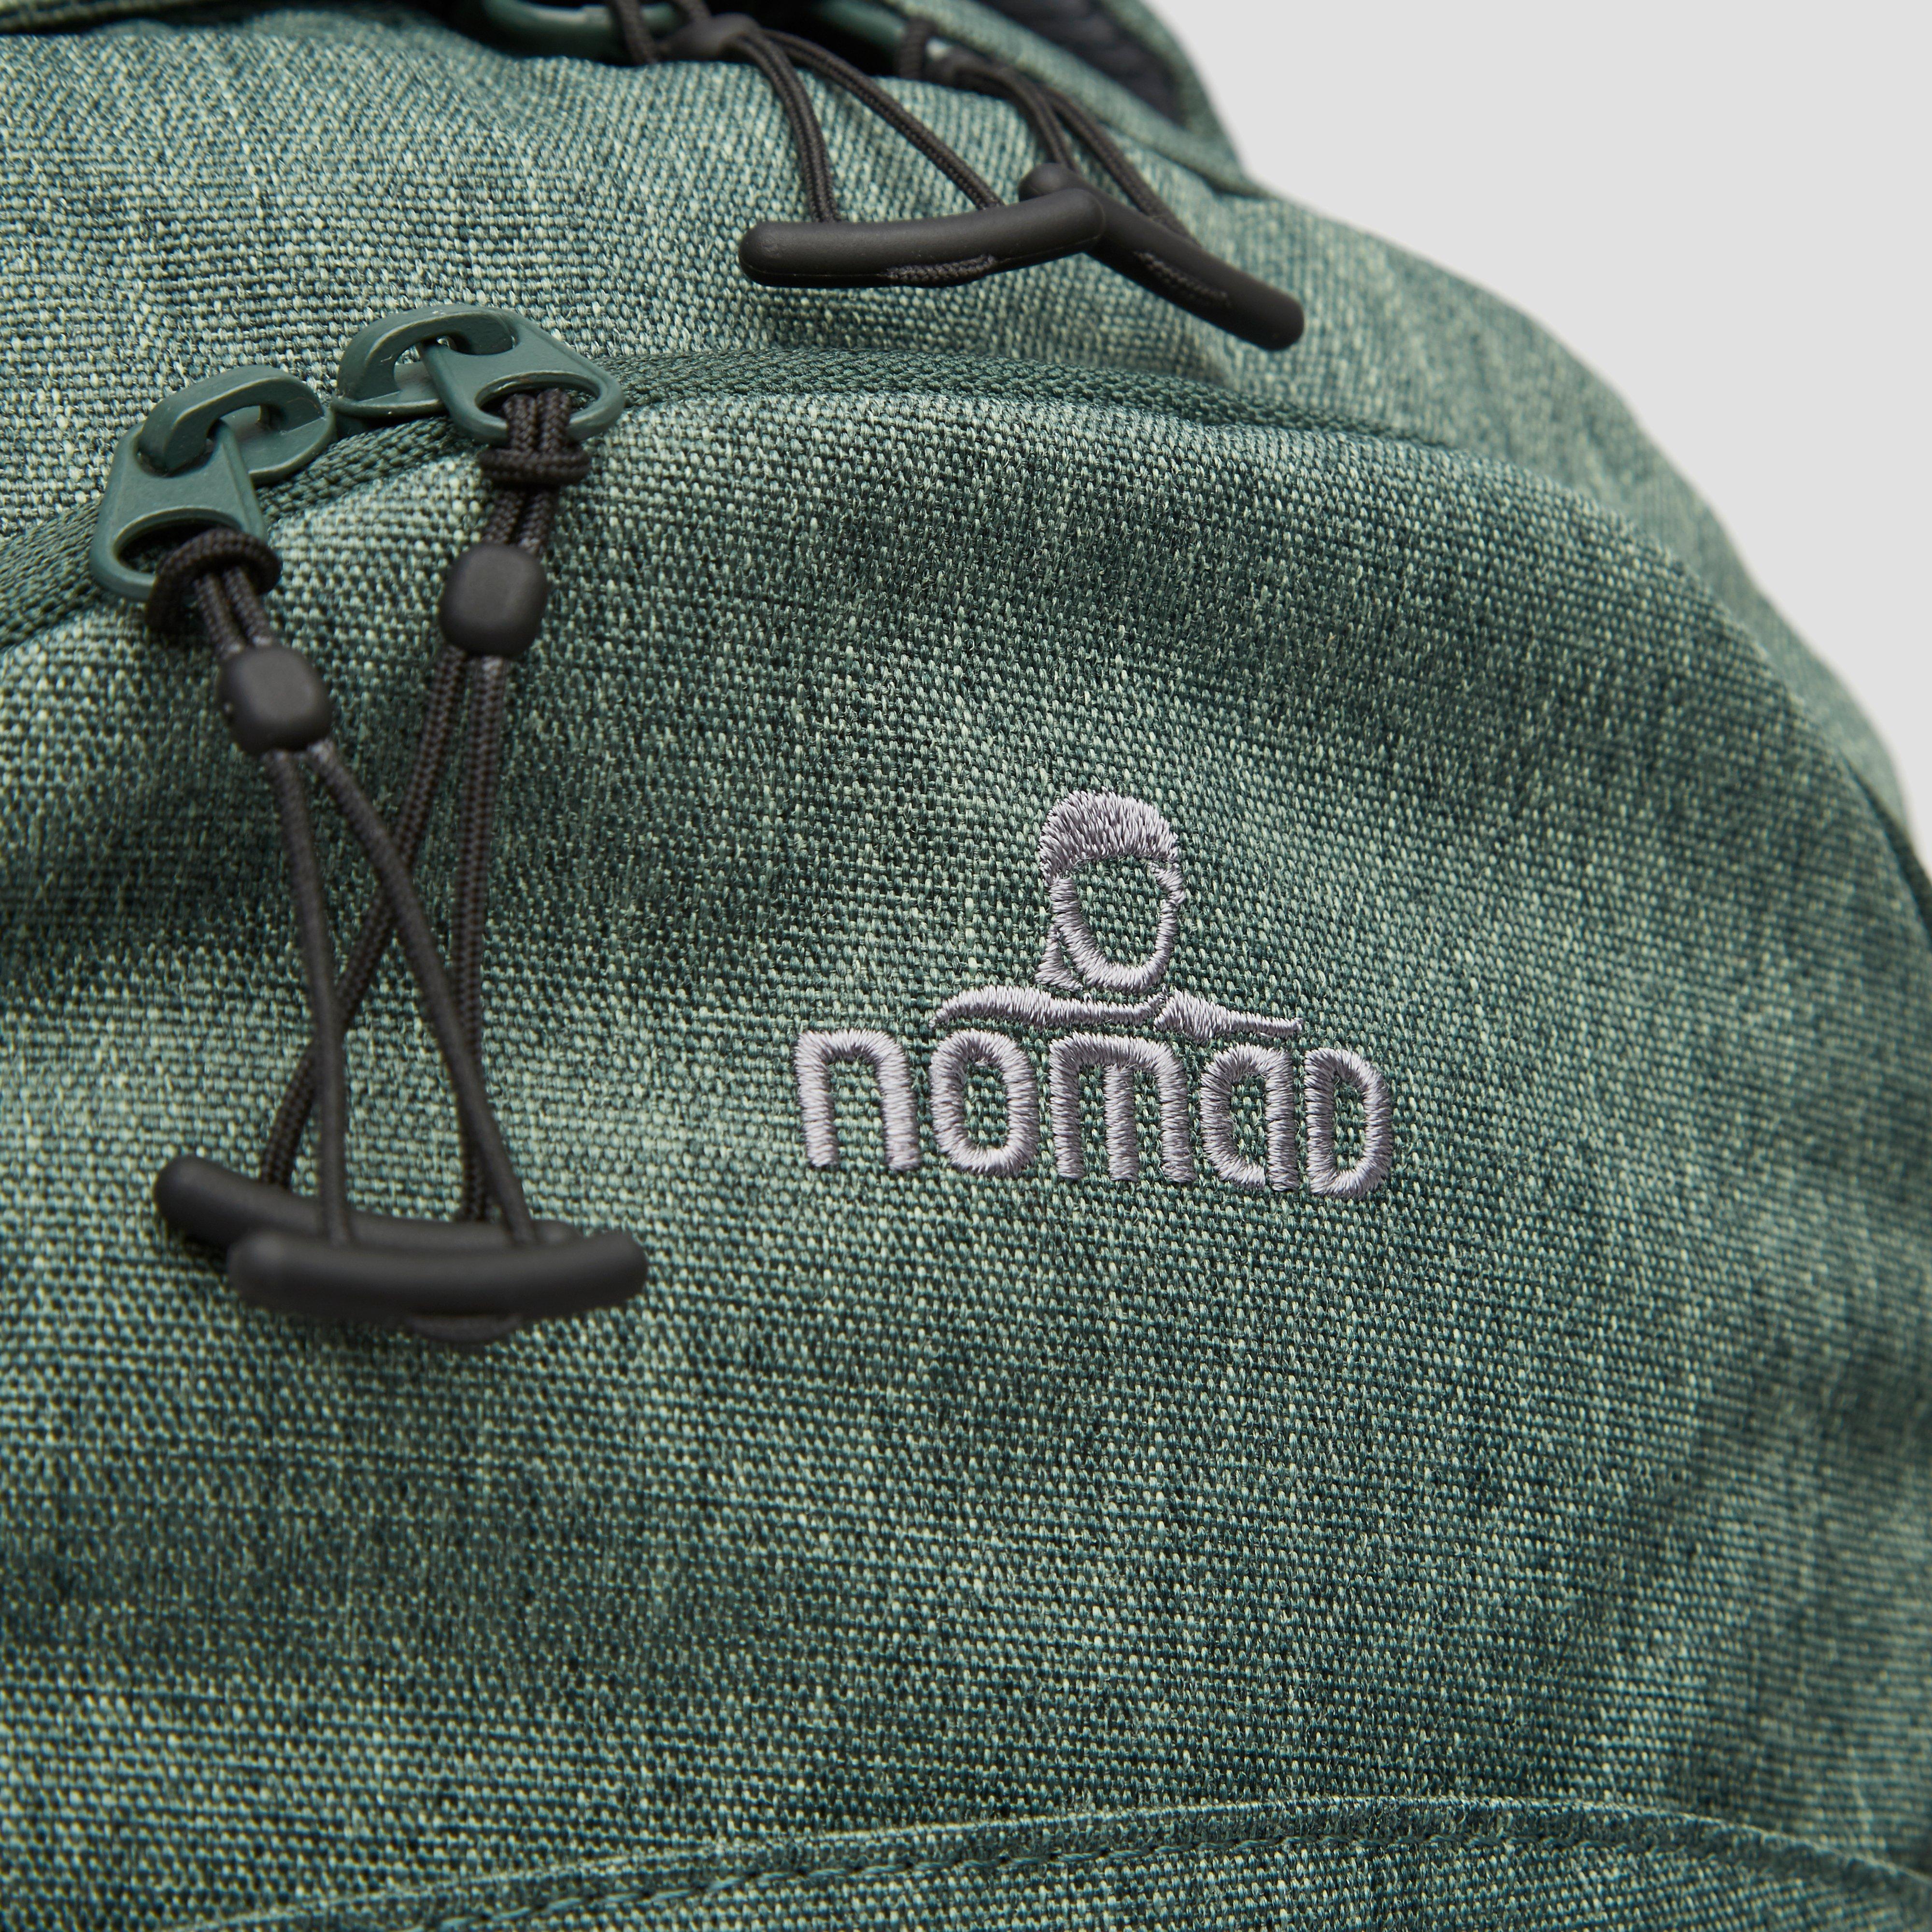 NOMAD BARITE DAYPACK 18 LITER GROEN